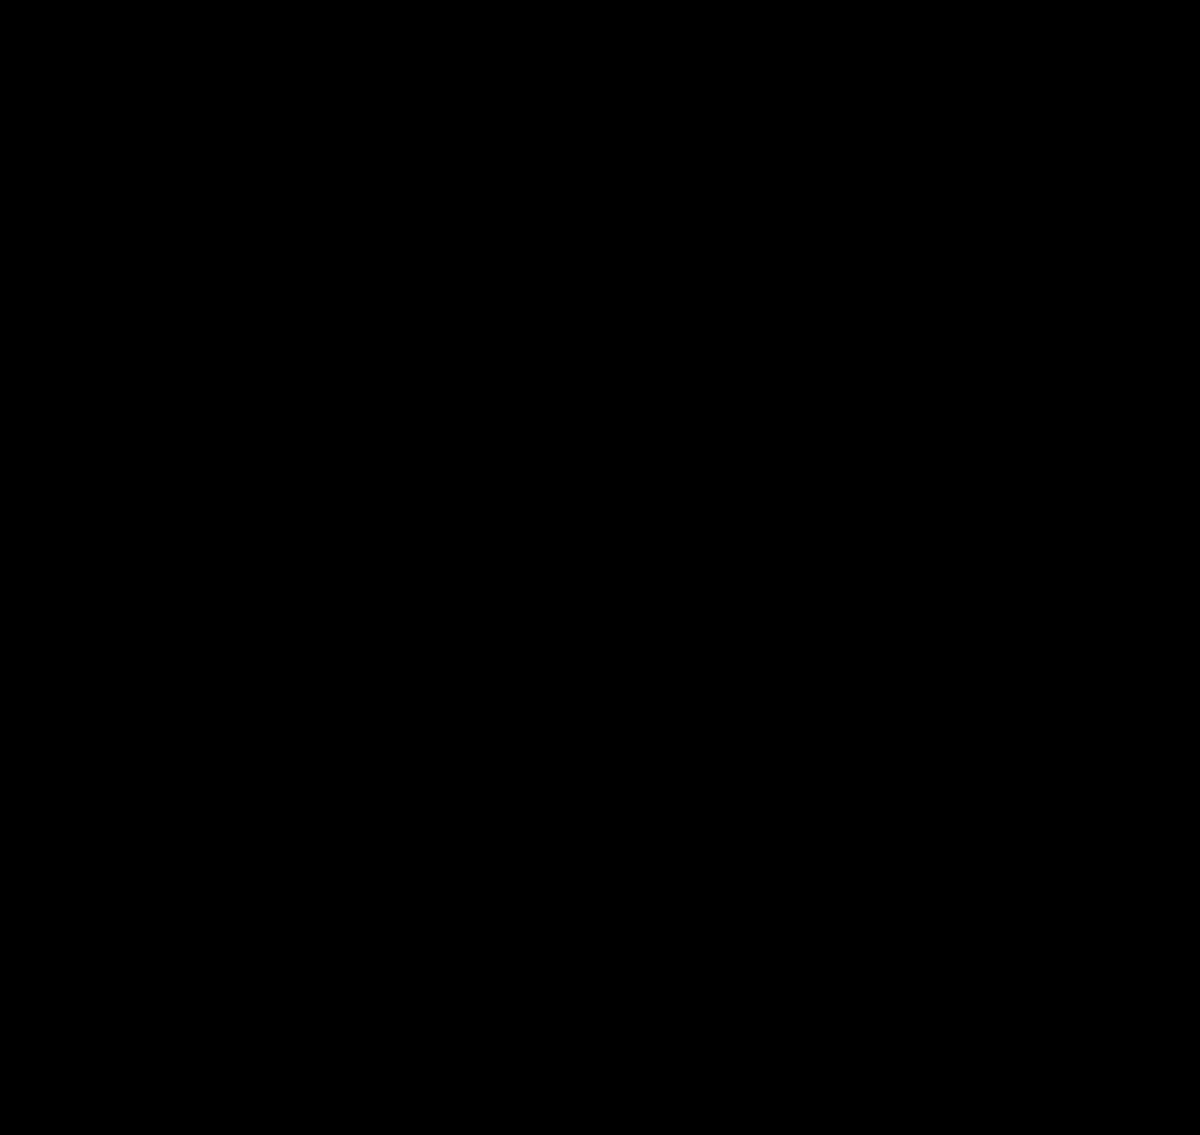 Суонзи U23 - Logo